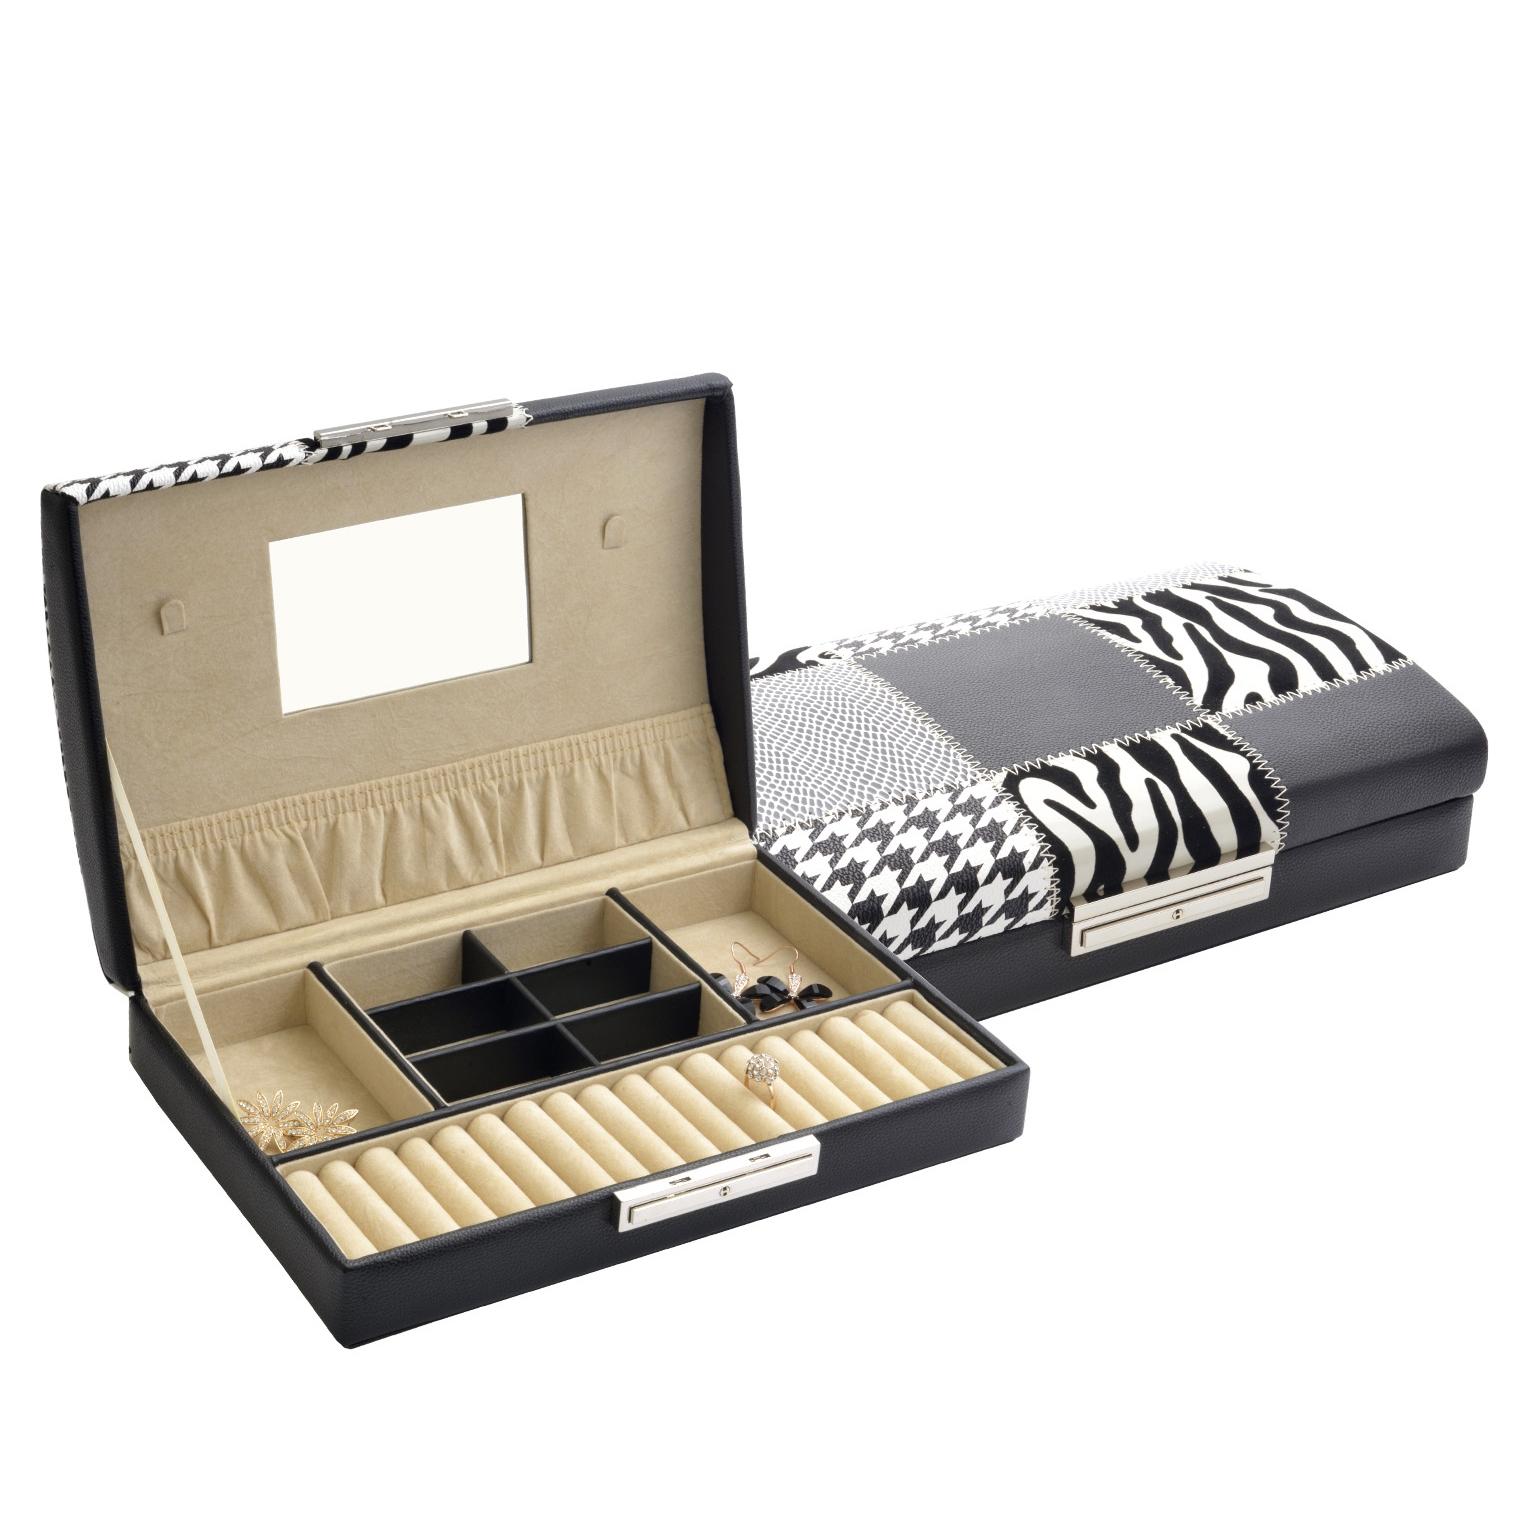 Šperkovnice koženková - černá SVK1149